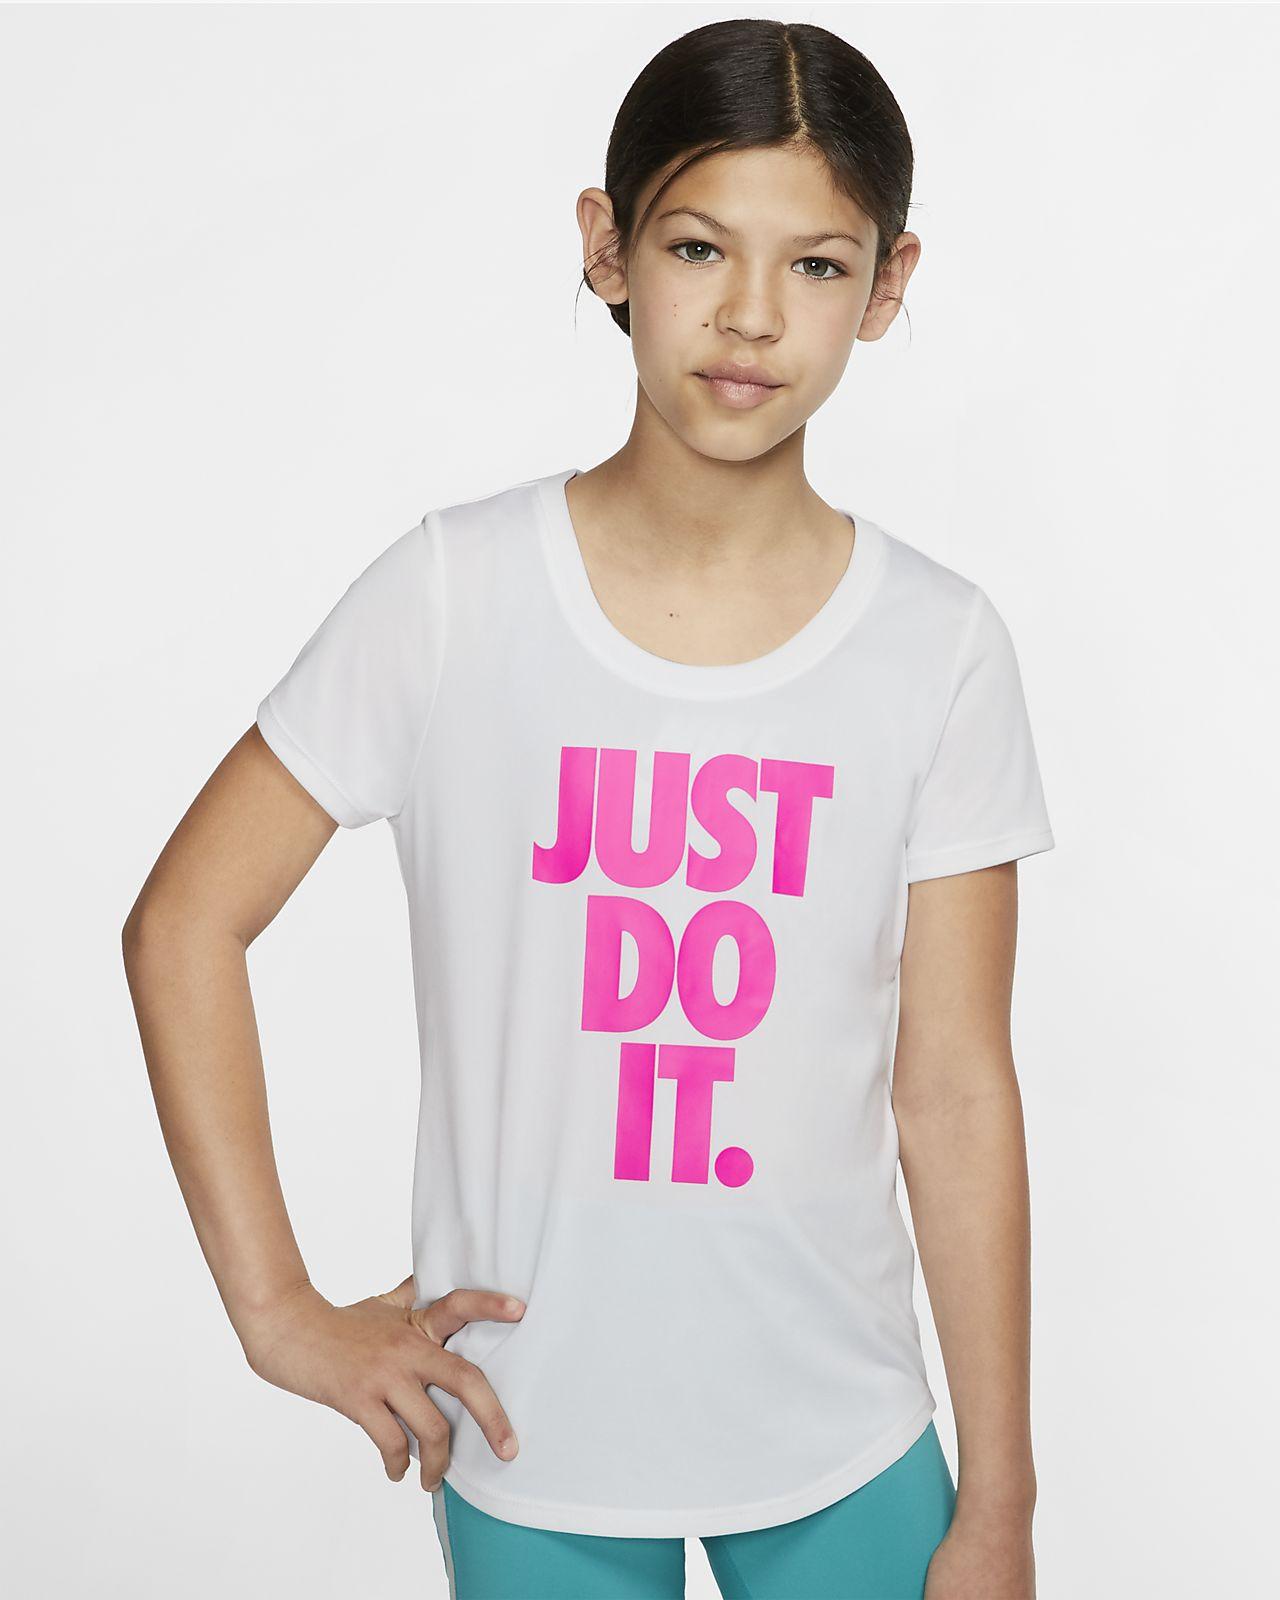 Nike Dri-FIT trenings-T-skjorte for store barn (jente)